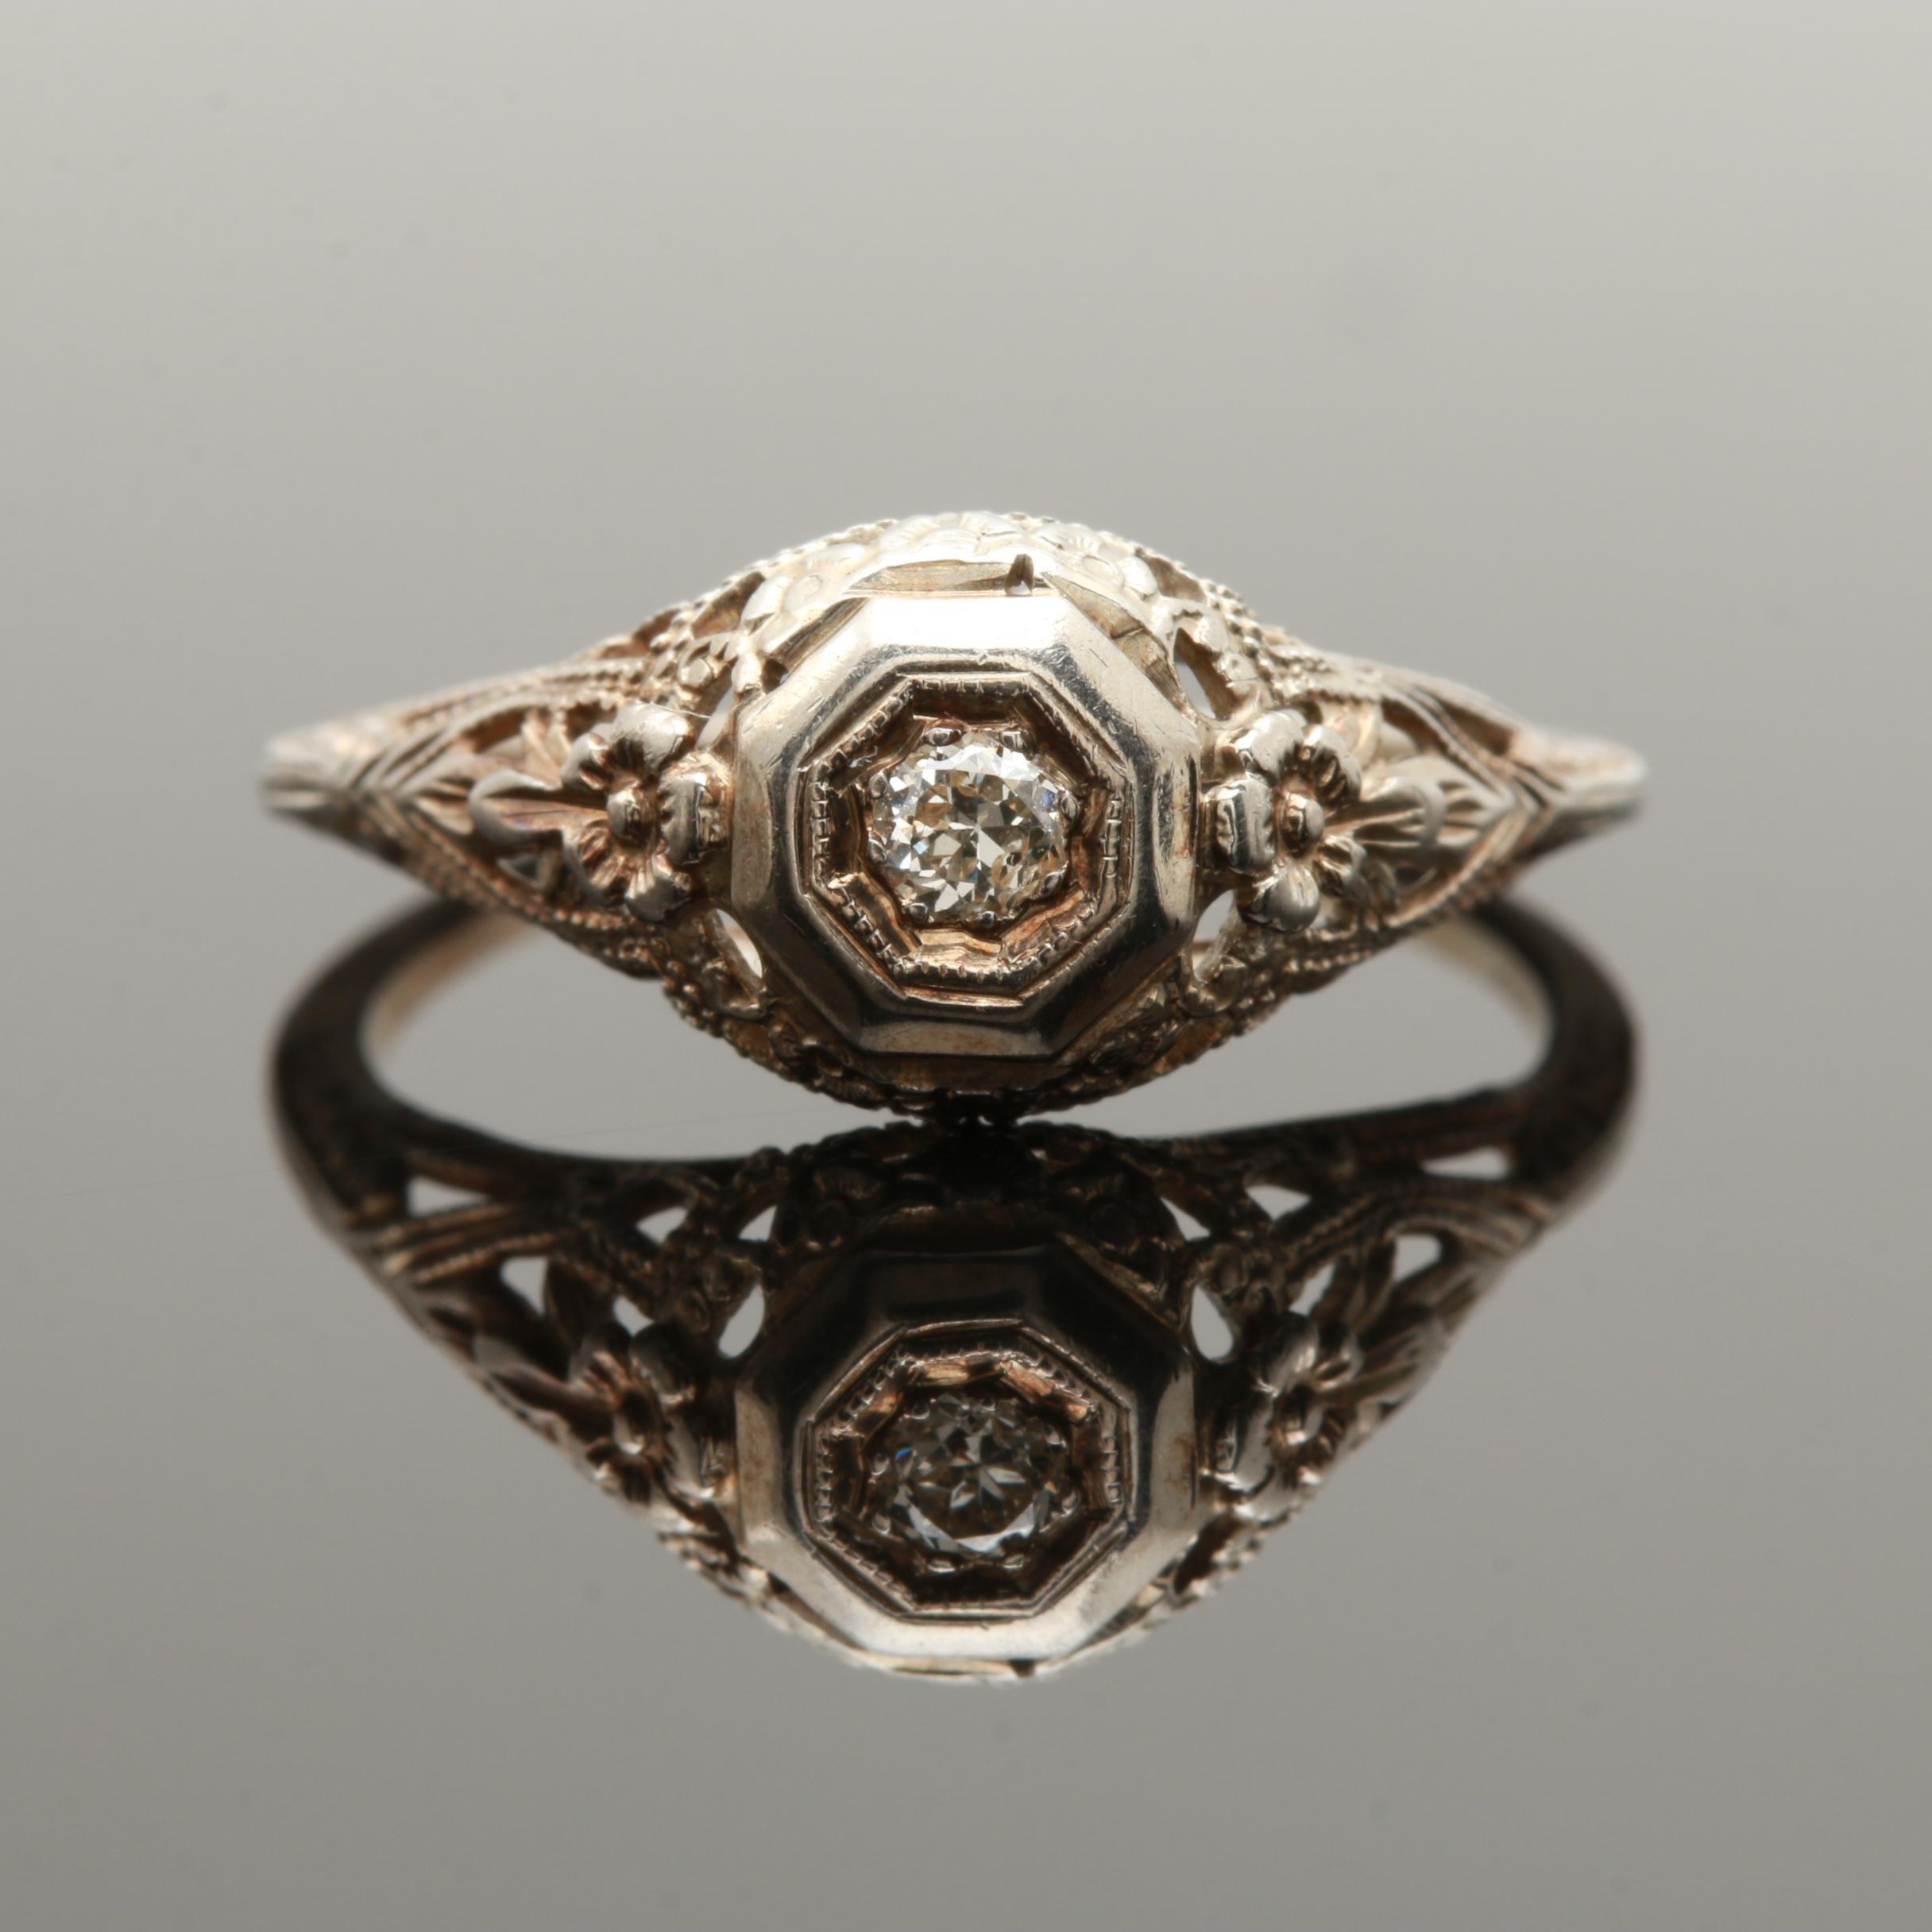 Edwardian 18K White Gold Diamond Ring